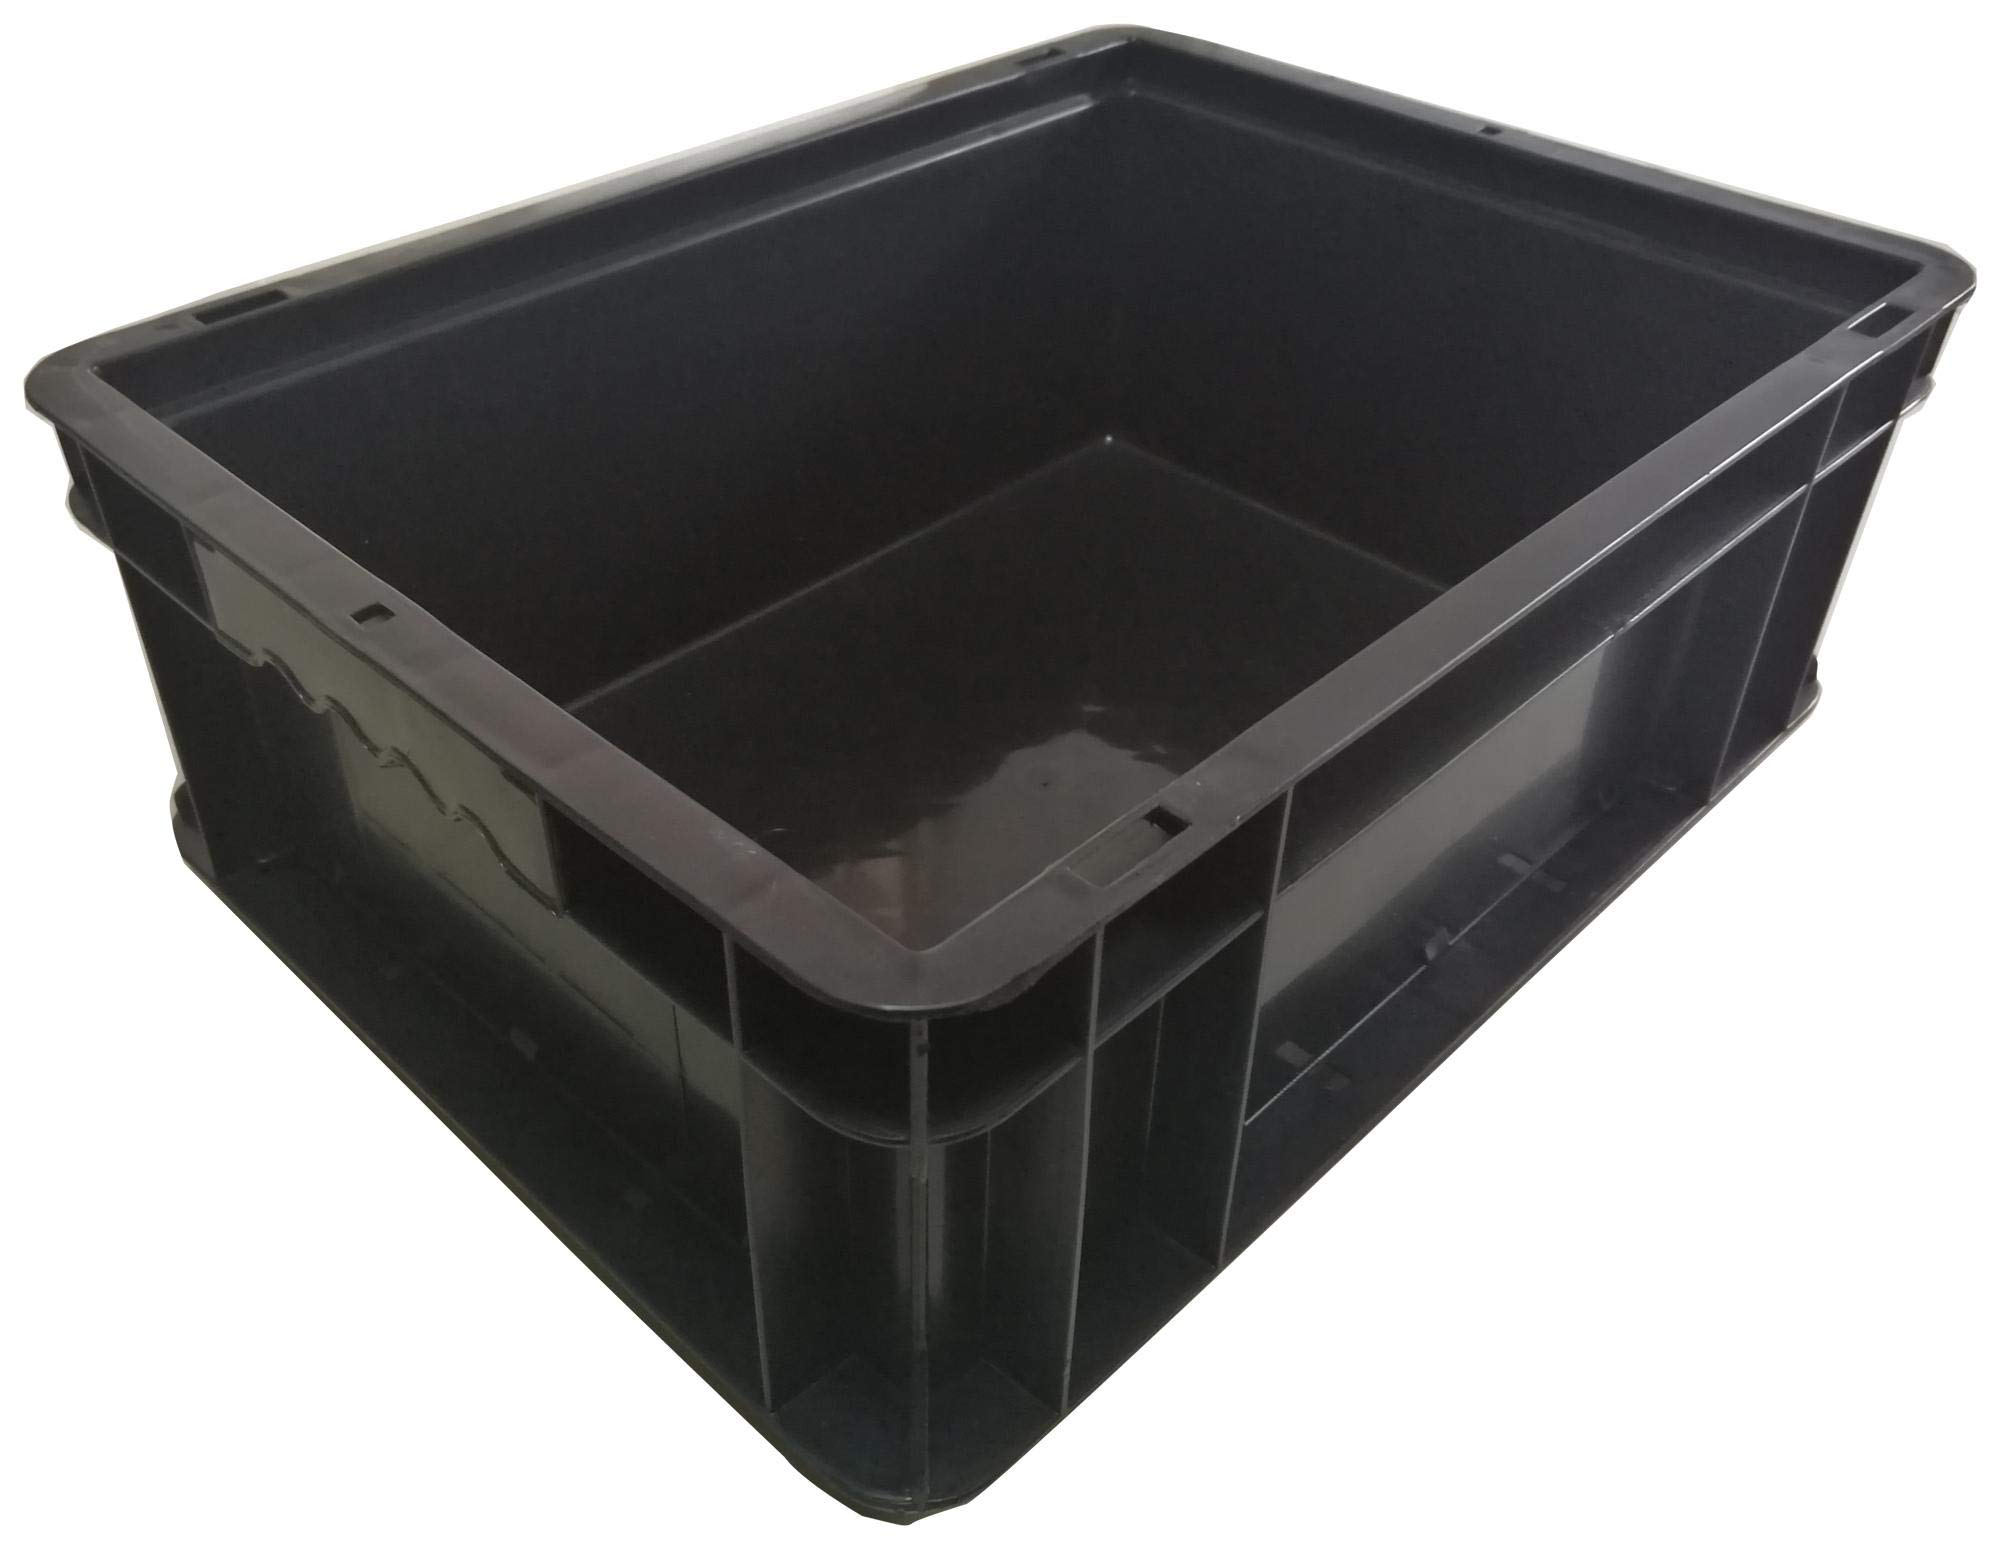 DURATOOL DT000243 Antistatic Storage, Box, 5.91 inch, 150 mm, 11.81 inch, 300 mm, 15.75 inch